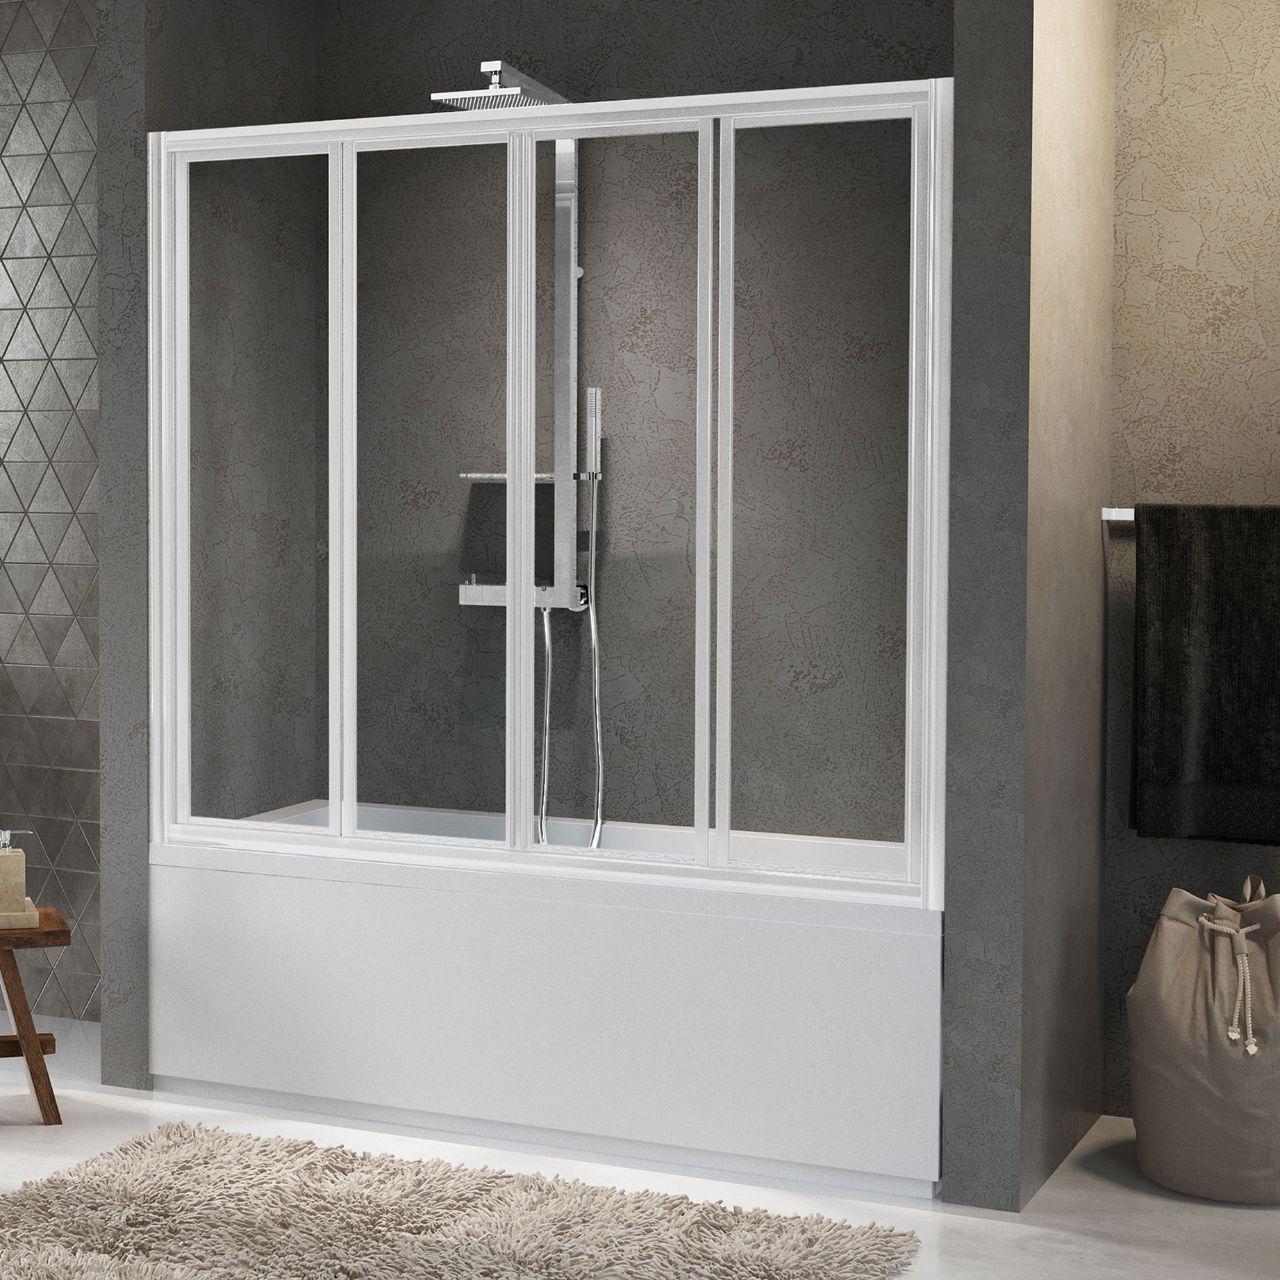 pare baignoires aurora 2sv4 novellini. Black Bedroom Furniture Sets. Home Design Ideas